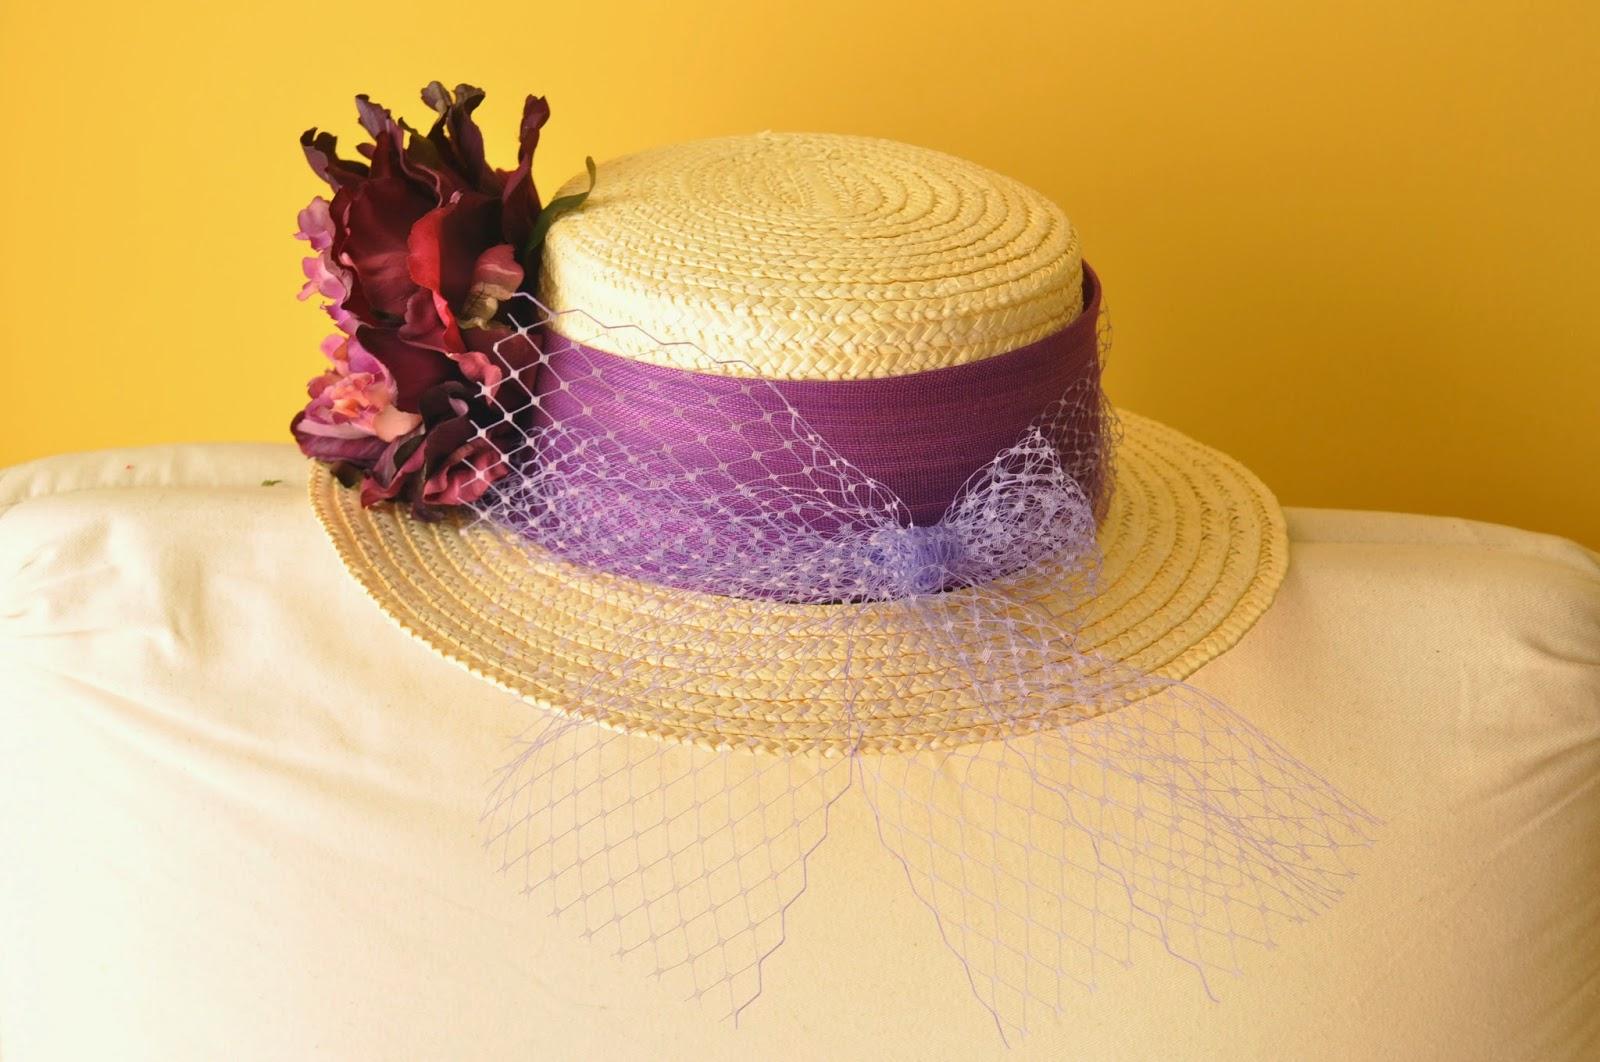 canotier para bodas, canotier económico, sombrero para bodas, sombreros económicos, canotier morado, canotier con flor, canotier con tul morado